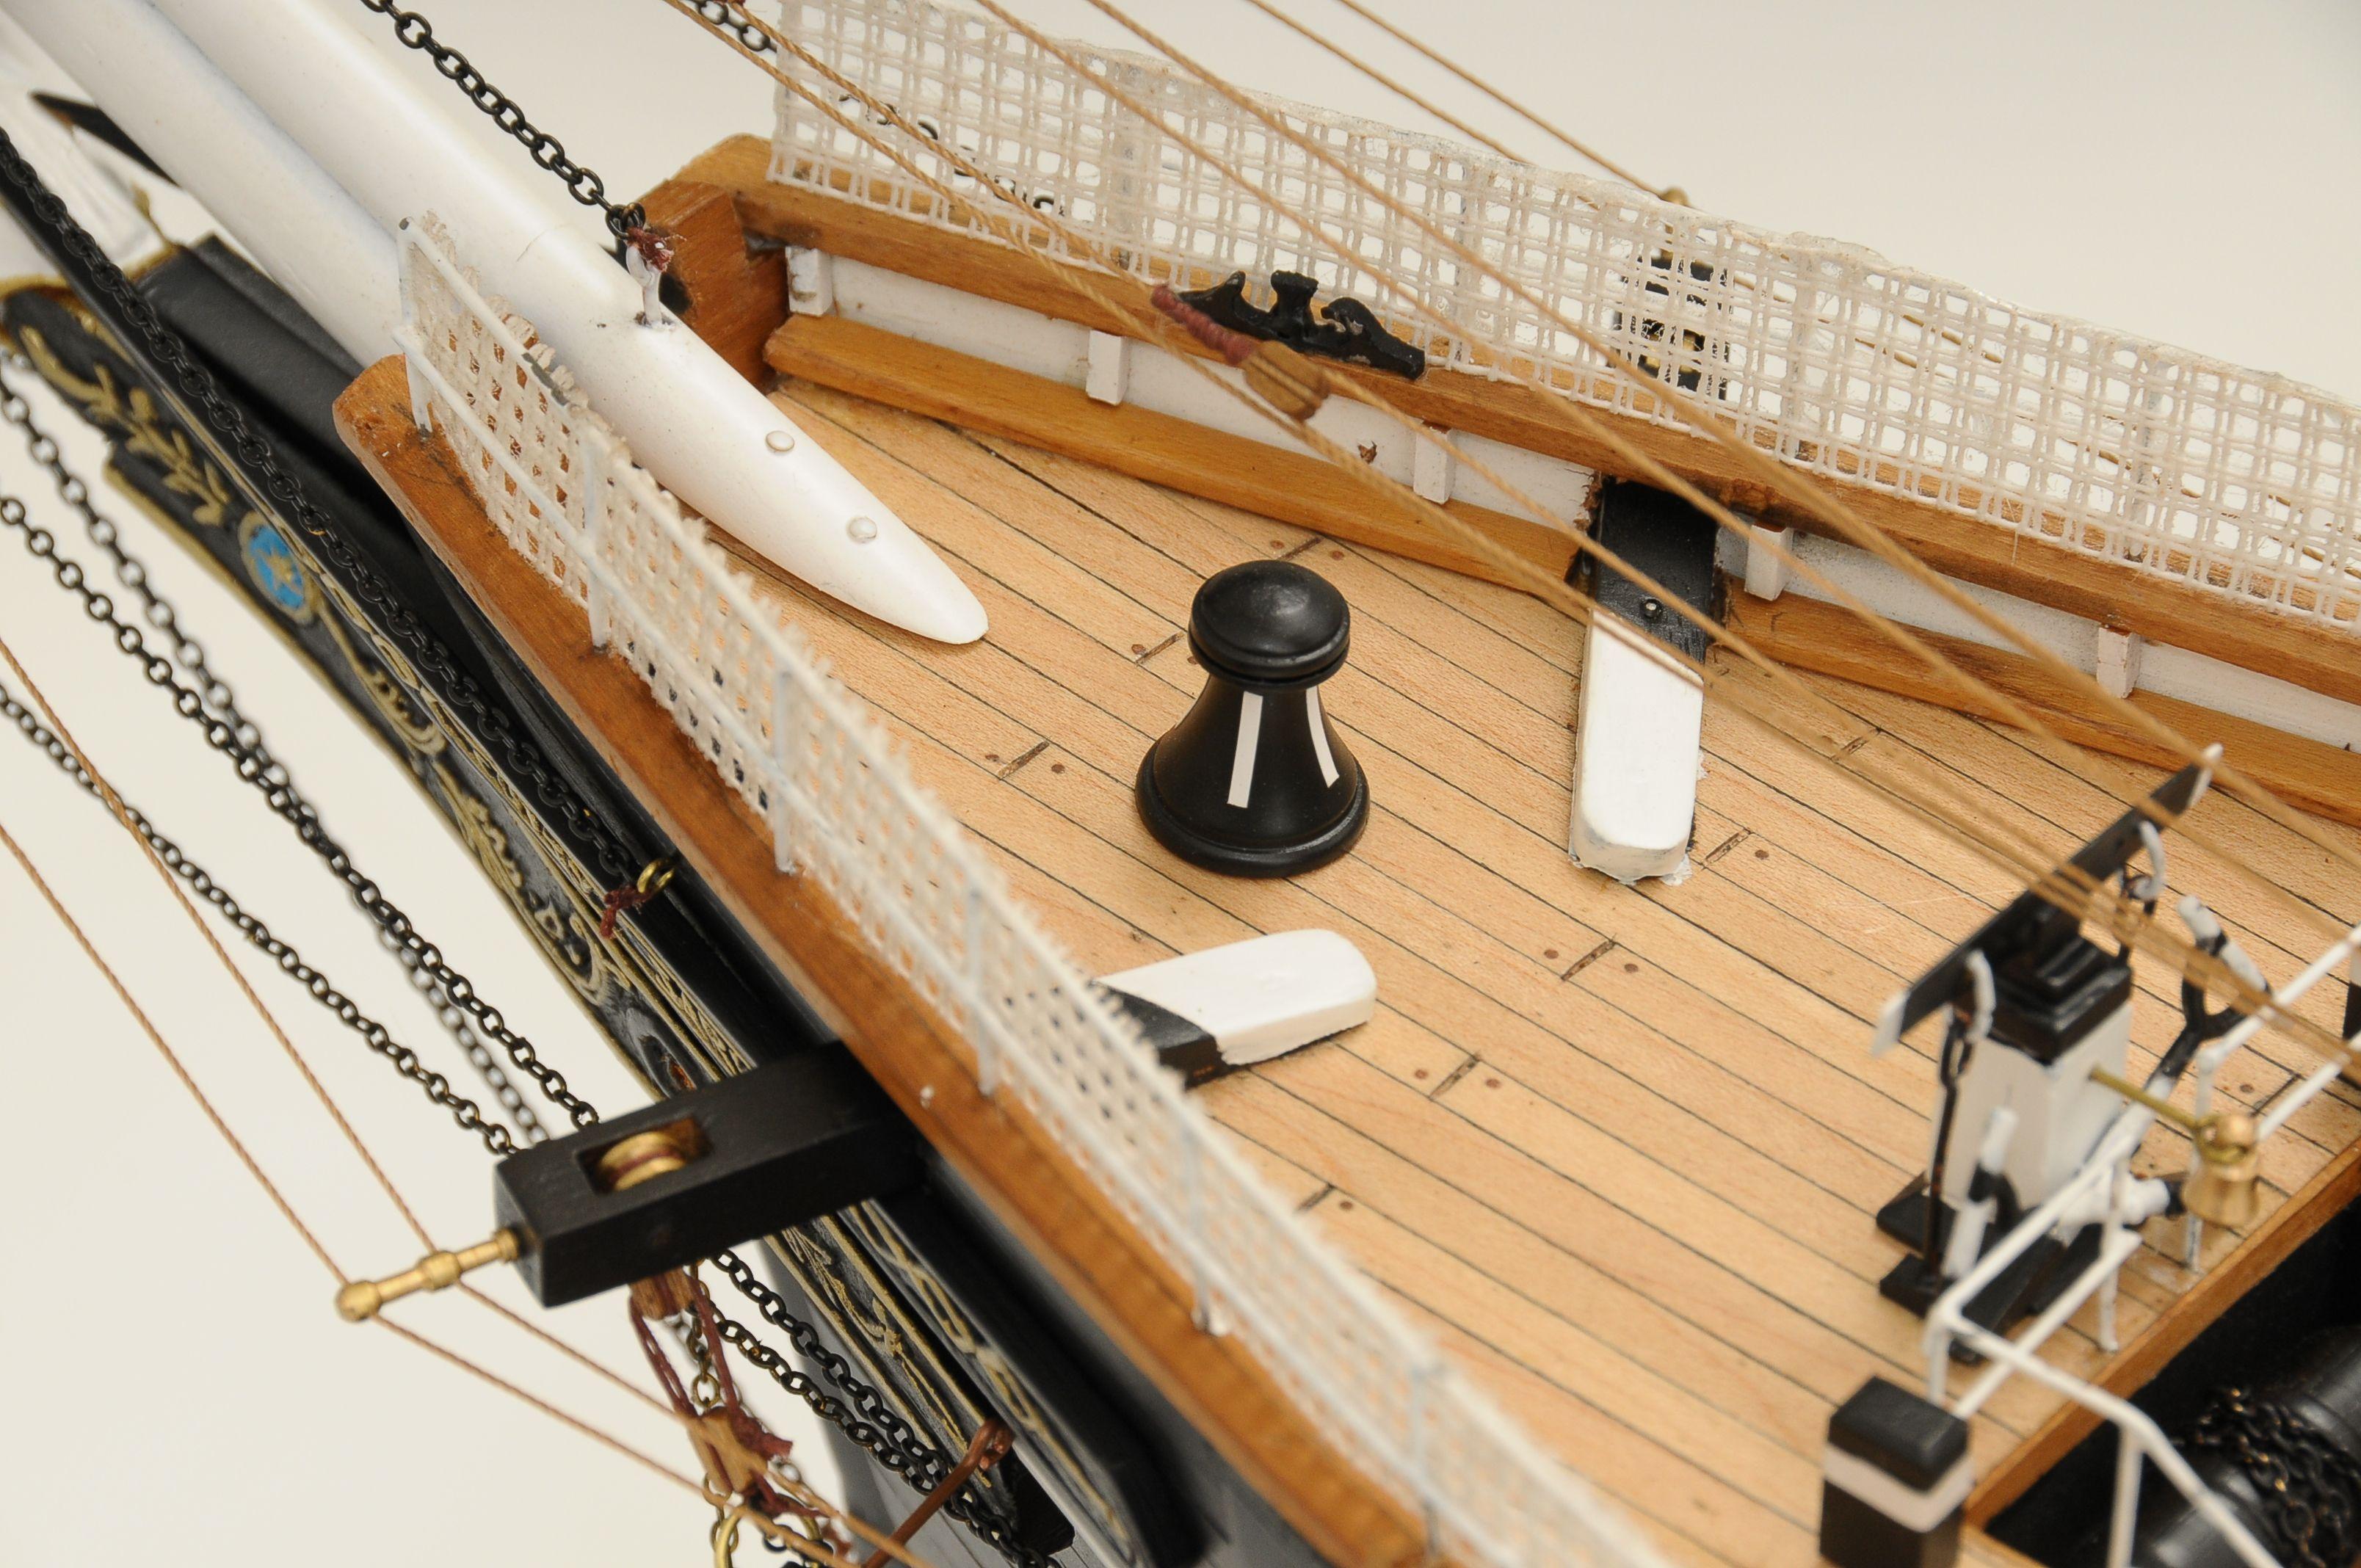 553-8675-Cutty-Sark-model-ship-Premier-Range